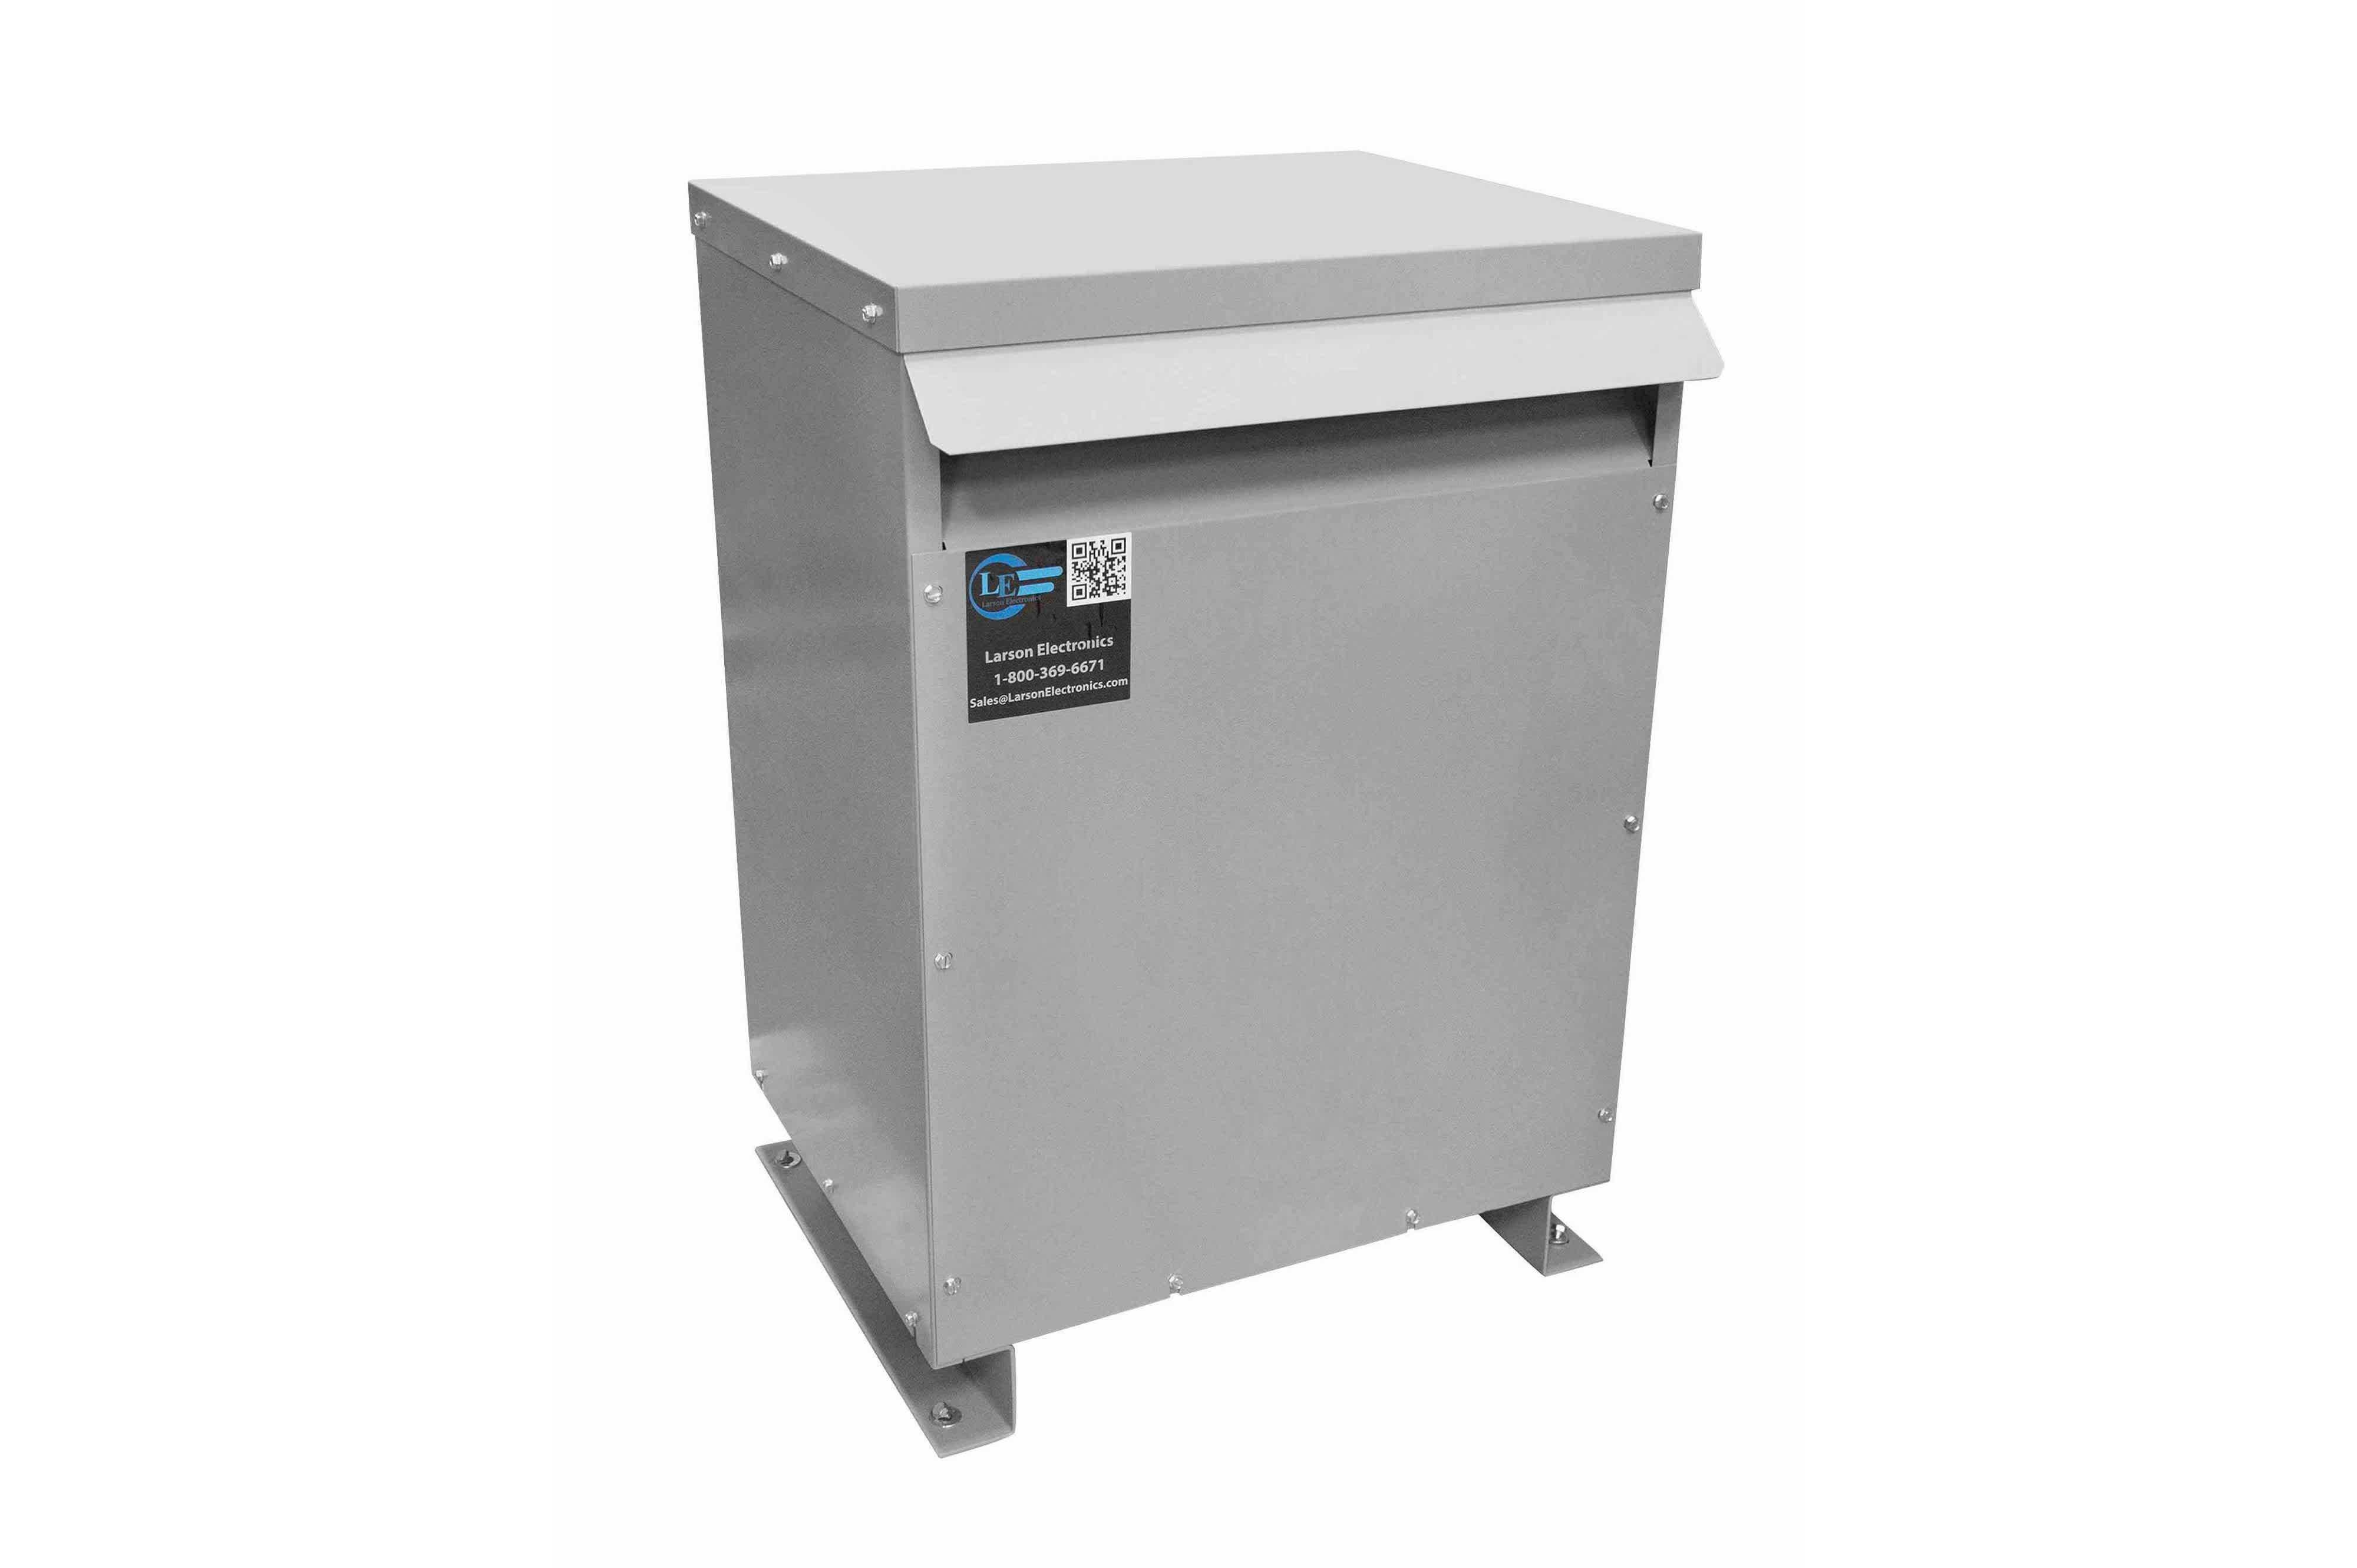 80 kVA 3PH Isolation Transformer, 460V Wye Primary, 240V/120 Delta Secondary, N3R, Ventilated, 60 Hz